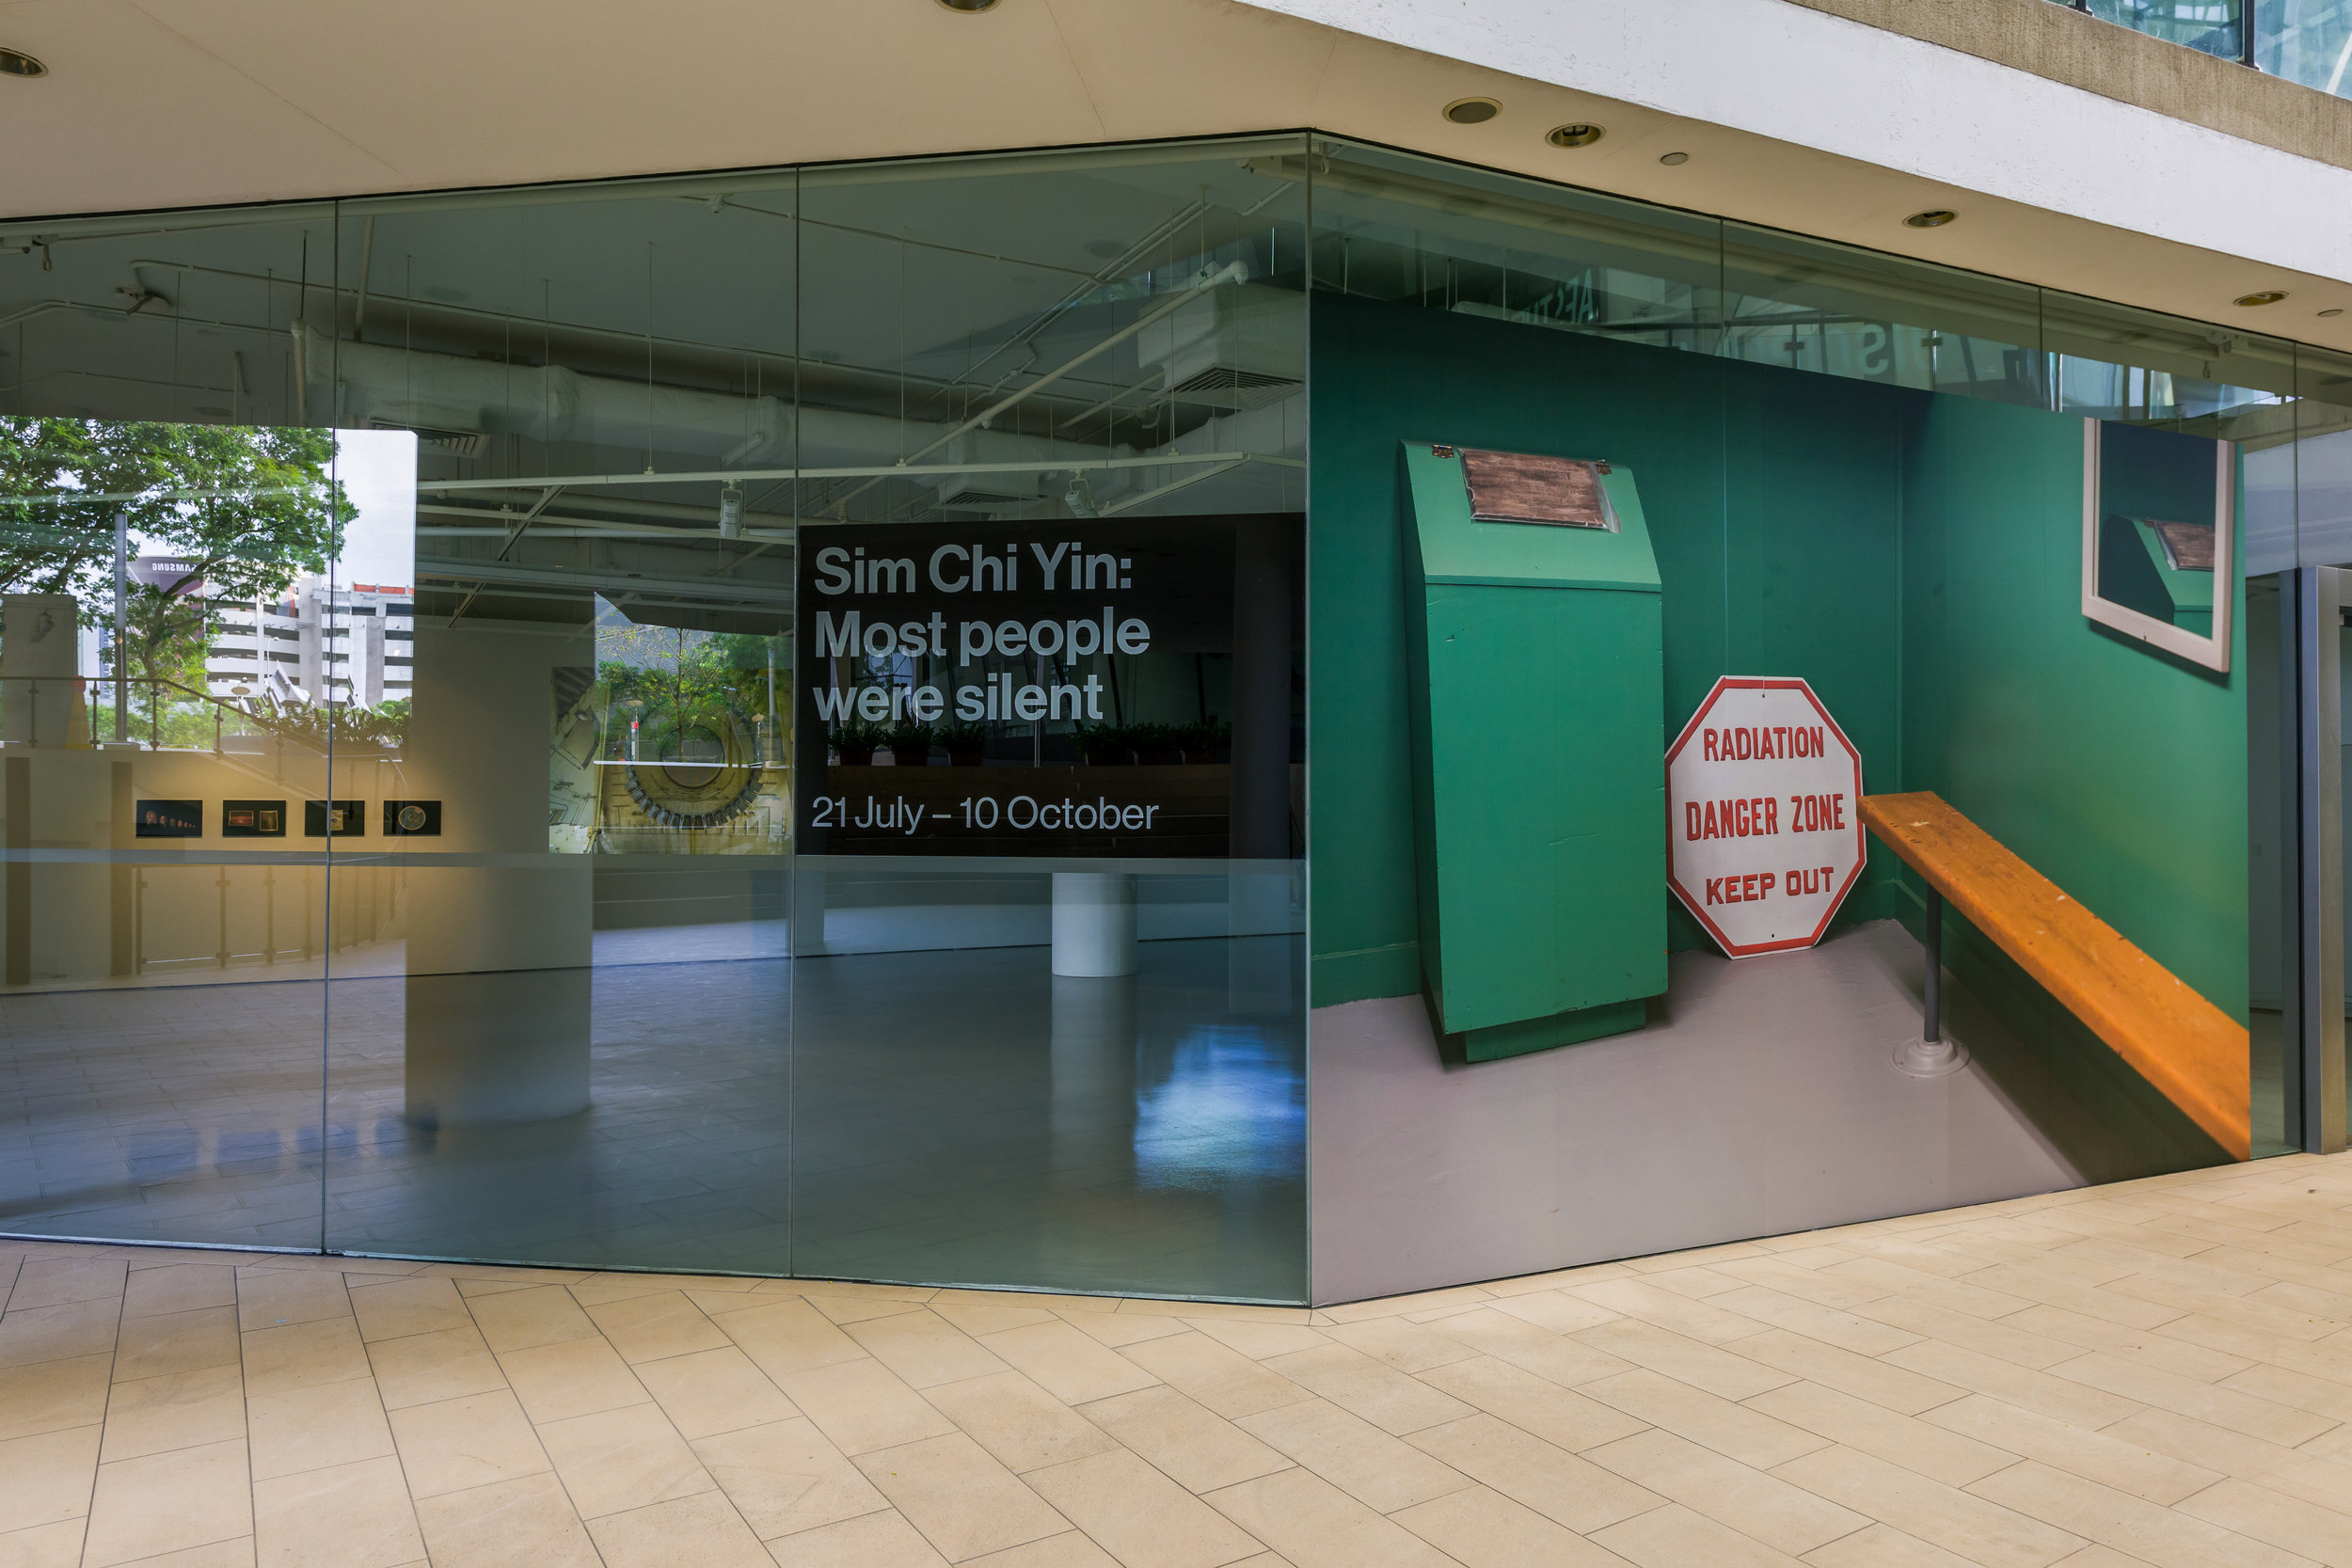 Exterior of Sim Chi Yin's exhibition at LASALLE. Photo credit: Deng Weizhong